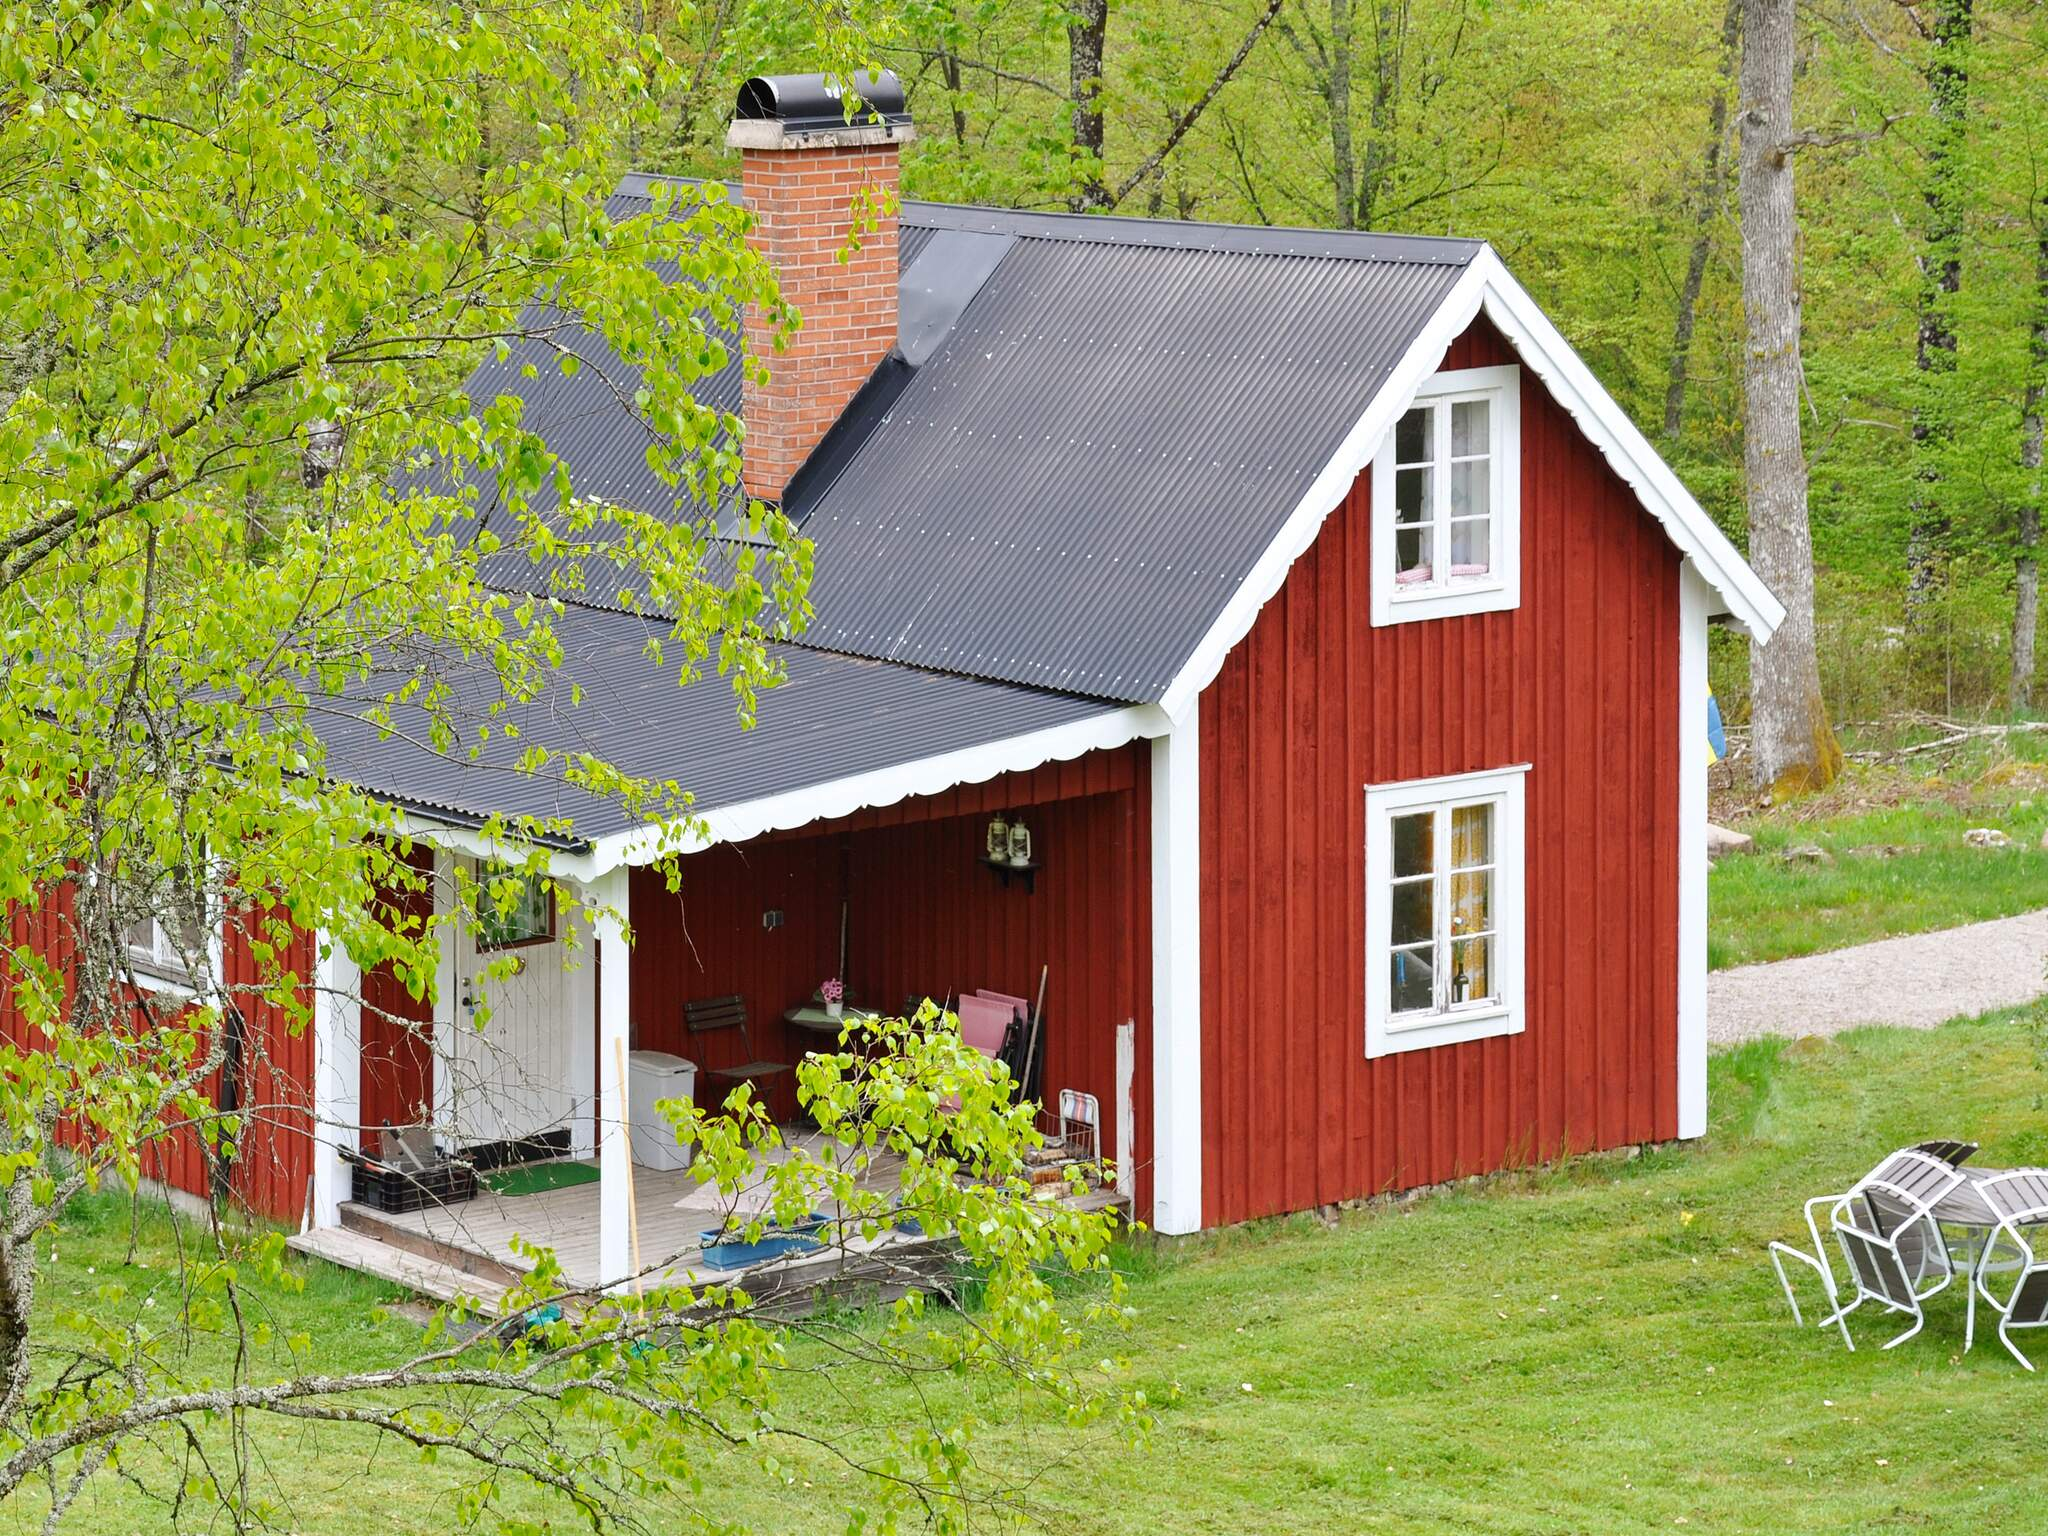 Ferienhaus Karlskrona (2624317), Eringsboda, Blekinge län, Südschweden, Schweden, Bild 12